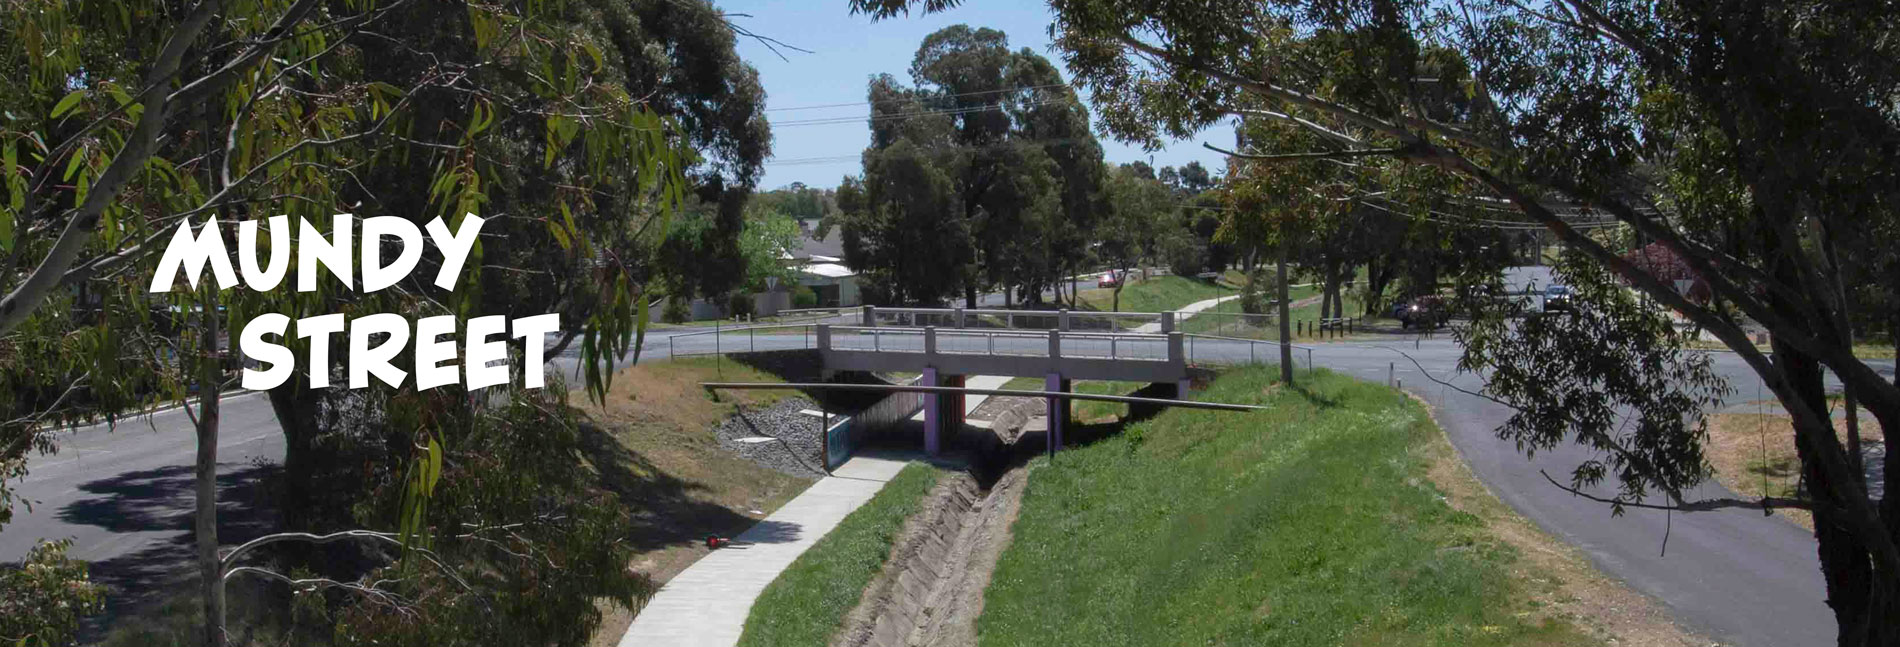 Project-Underpass-bridges-mundy-street-art-bendigo.jpg